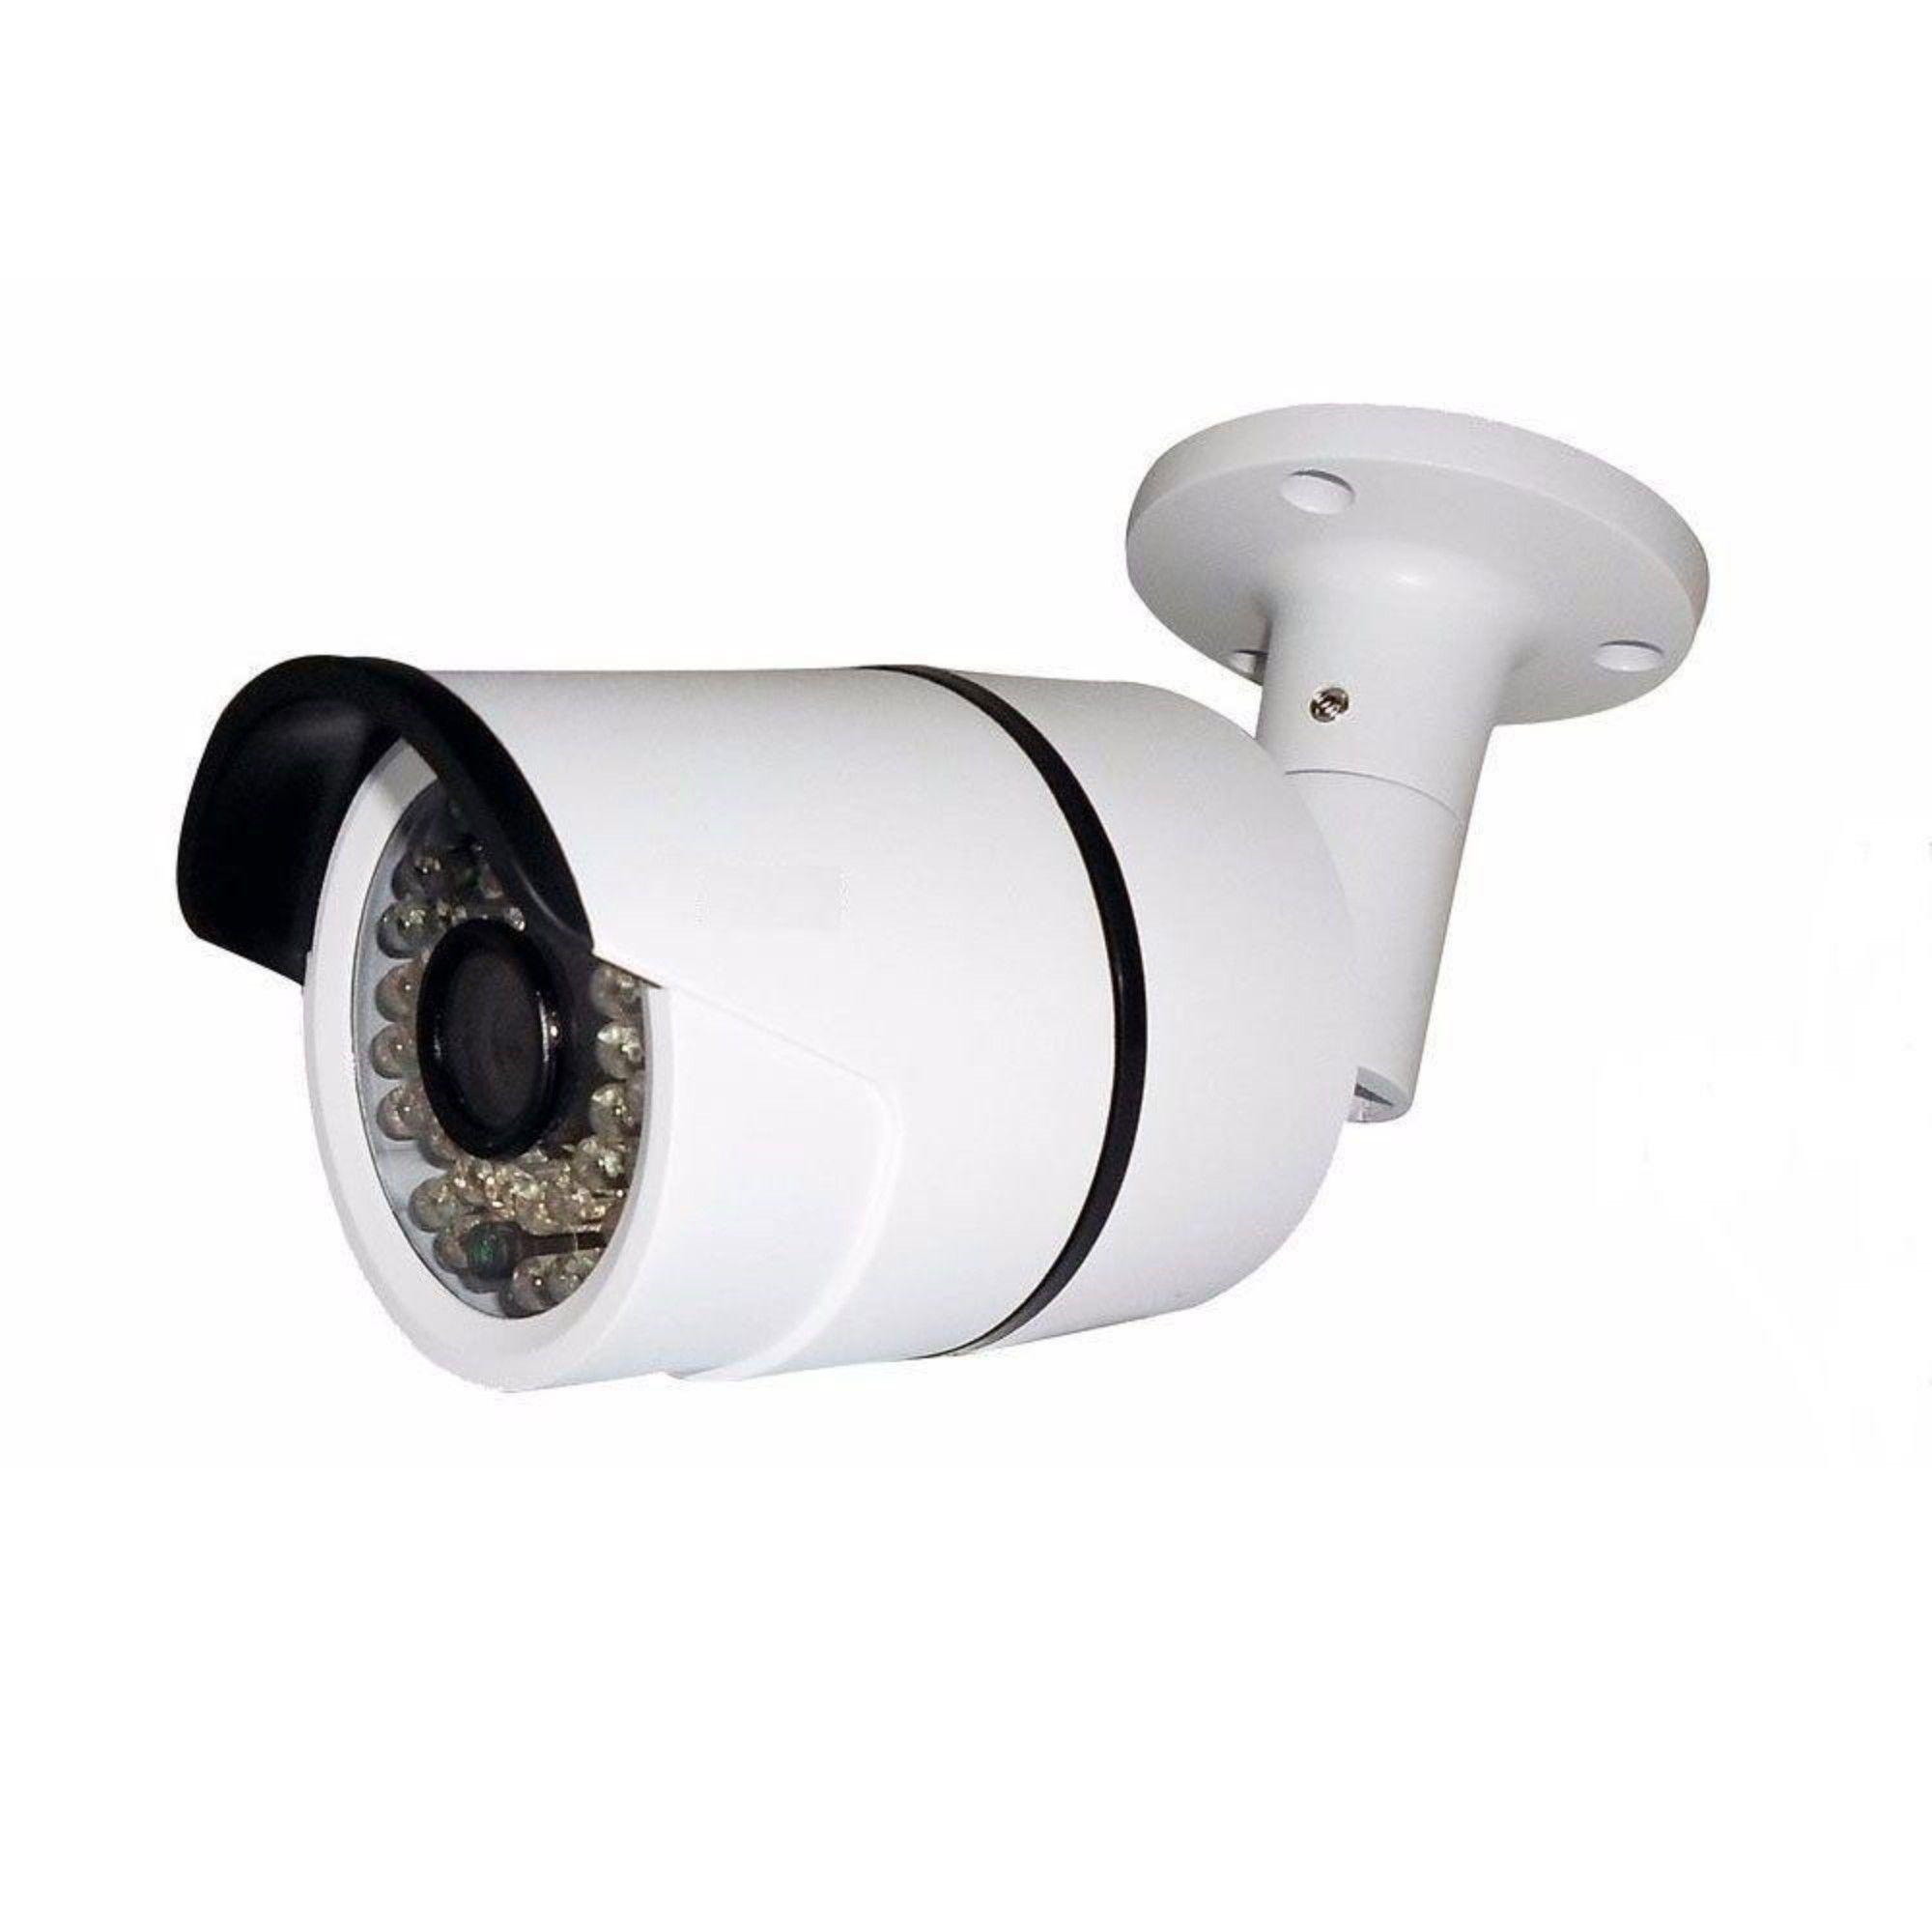 Kit CFTV Jortan Completo 12 Câmeras AHD 720p DVR 16 Canais